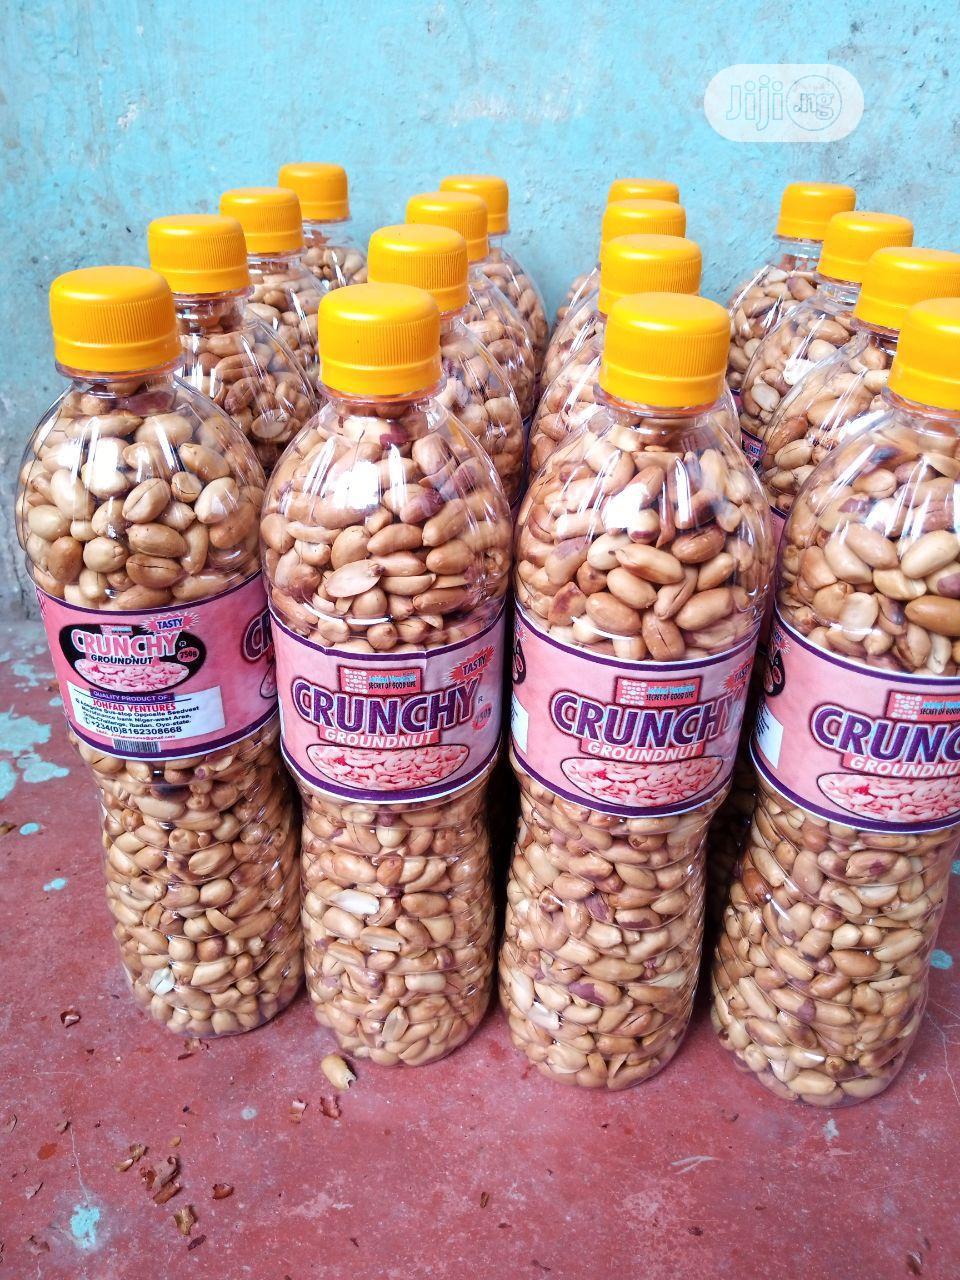 Crunchy Groundnut